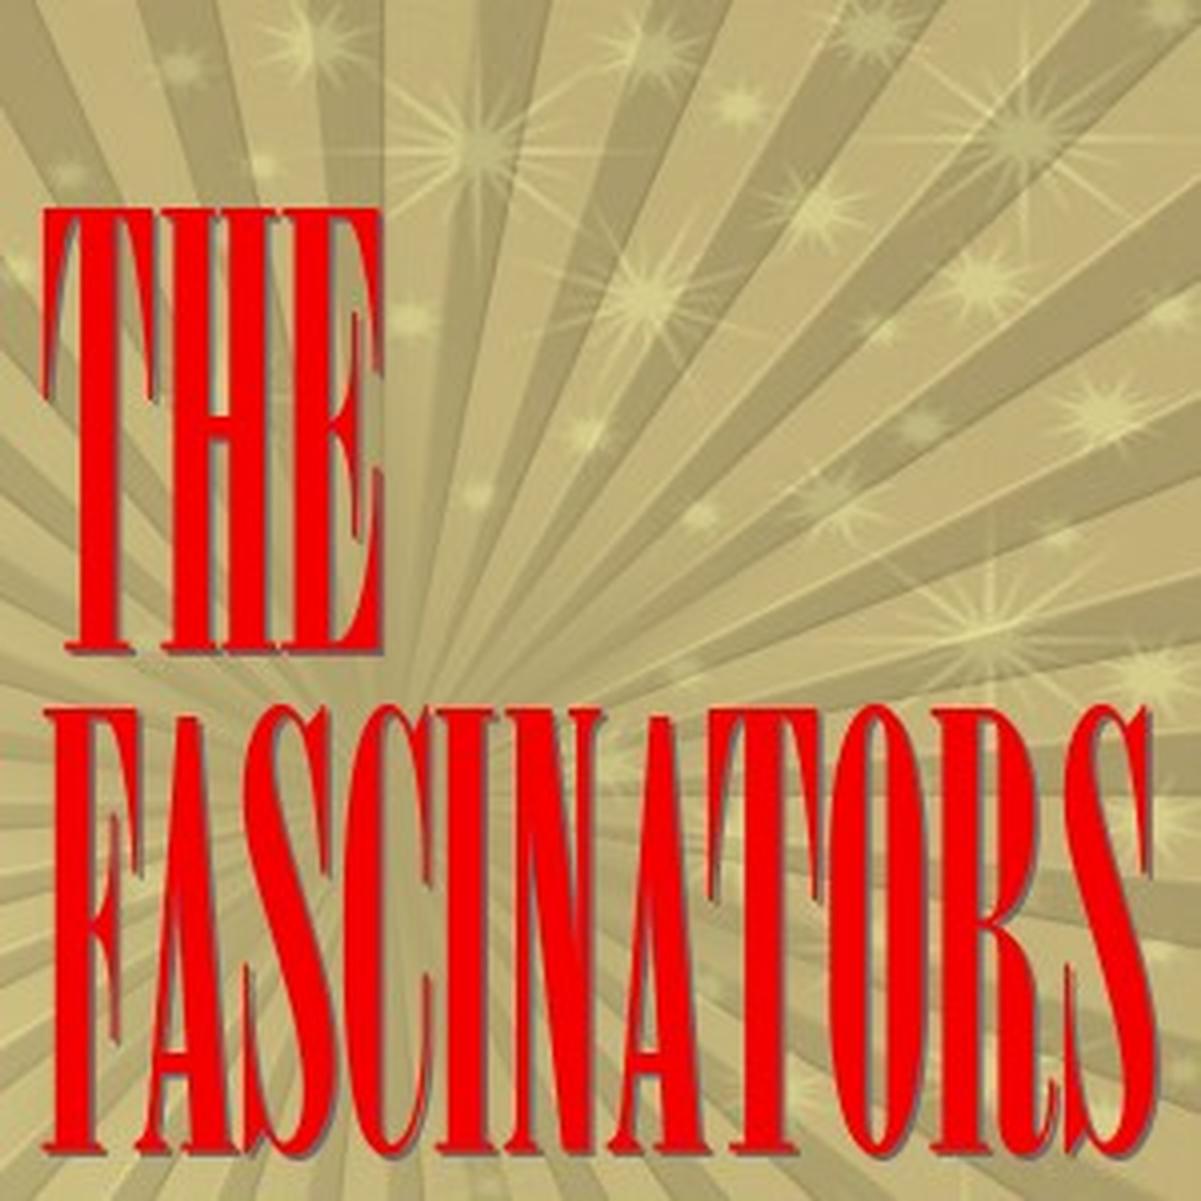 The Fascinators wiki, The Fascinators review, The Fascinators history, The Fascinators news